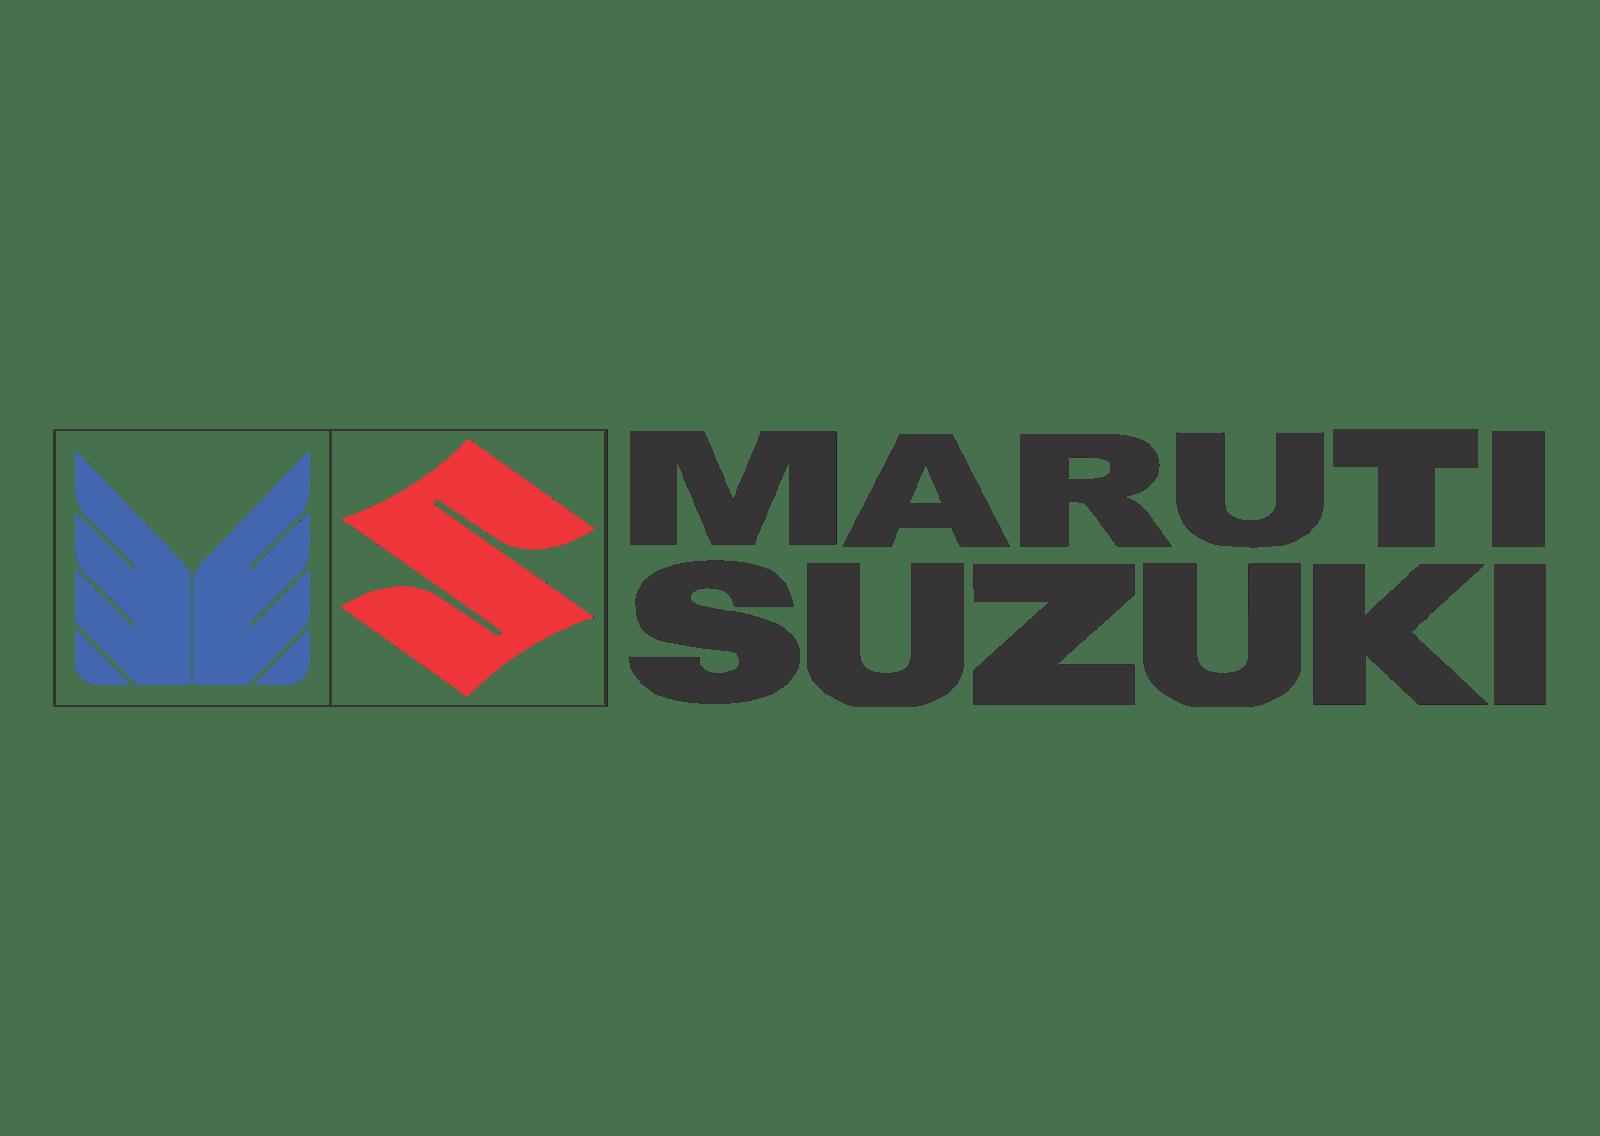 maruti-suzuki-vector-logo